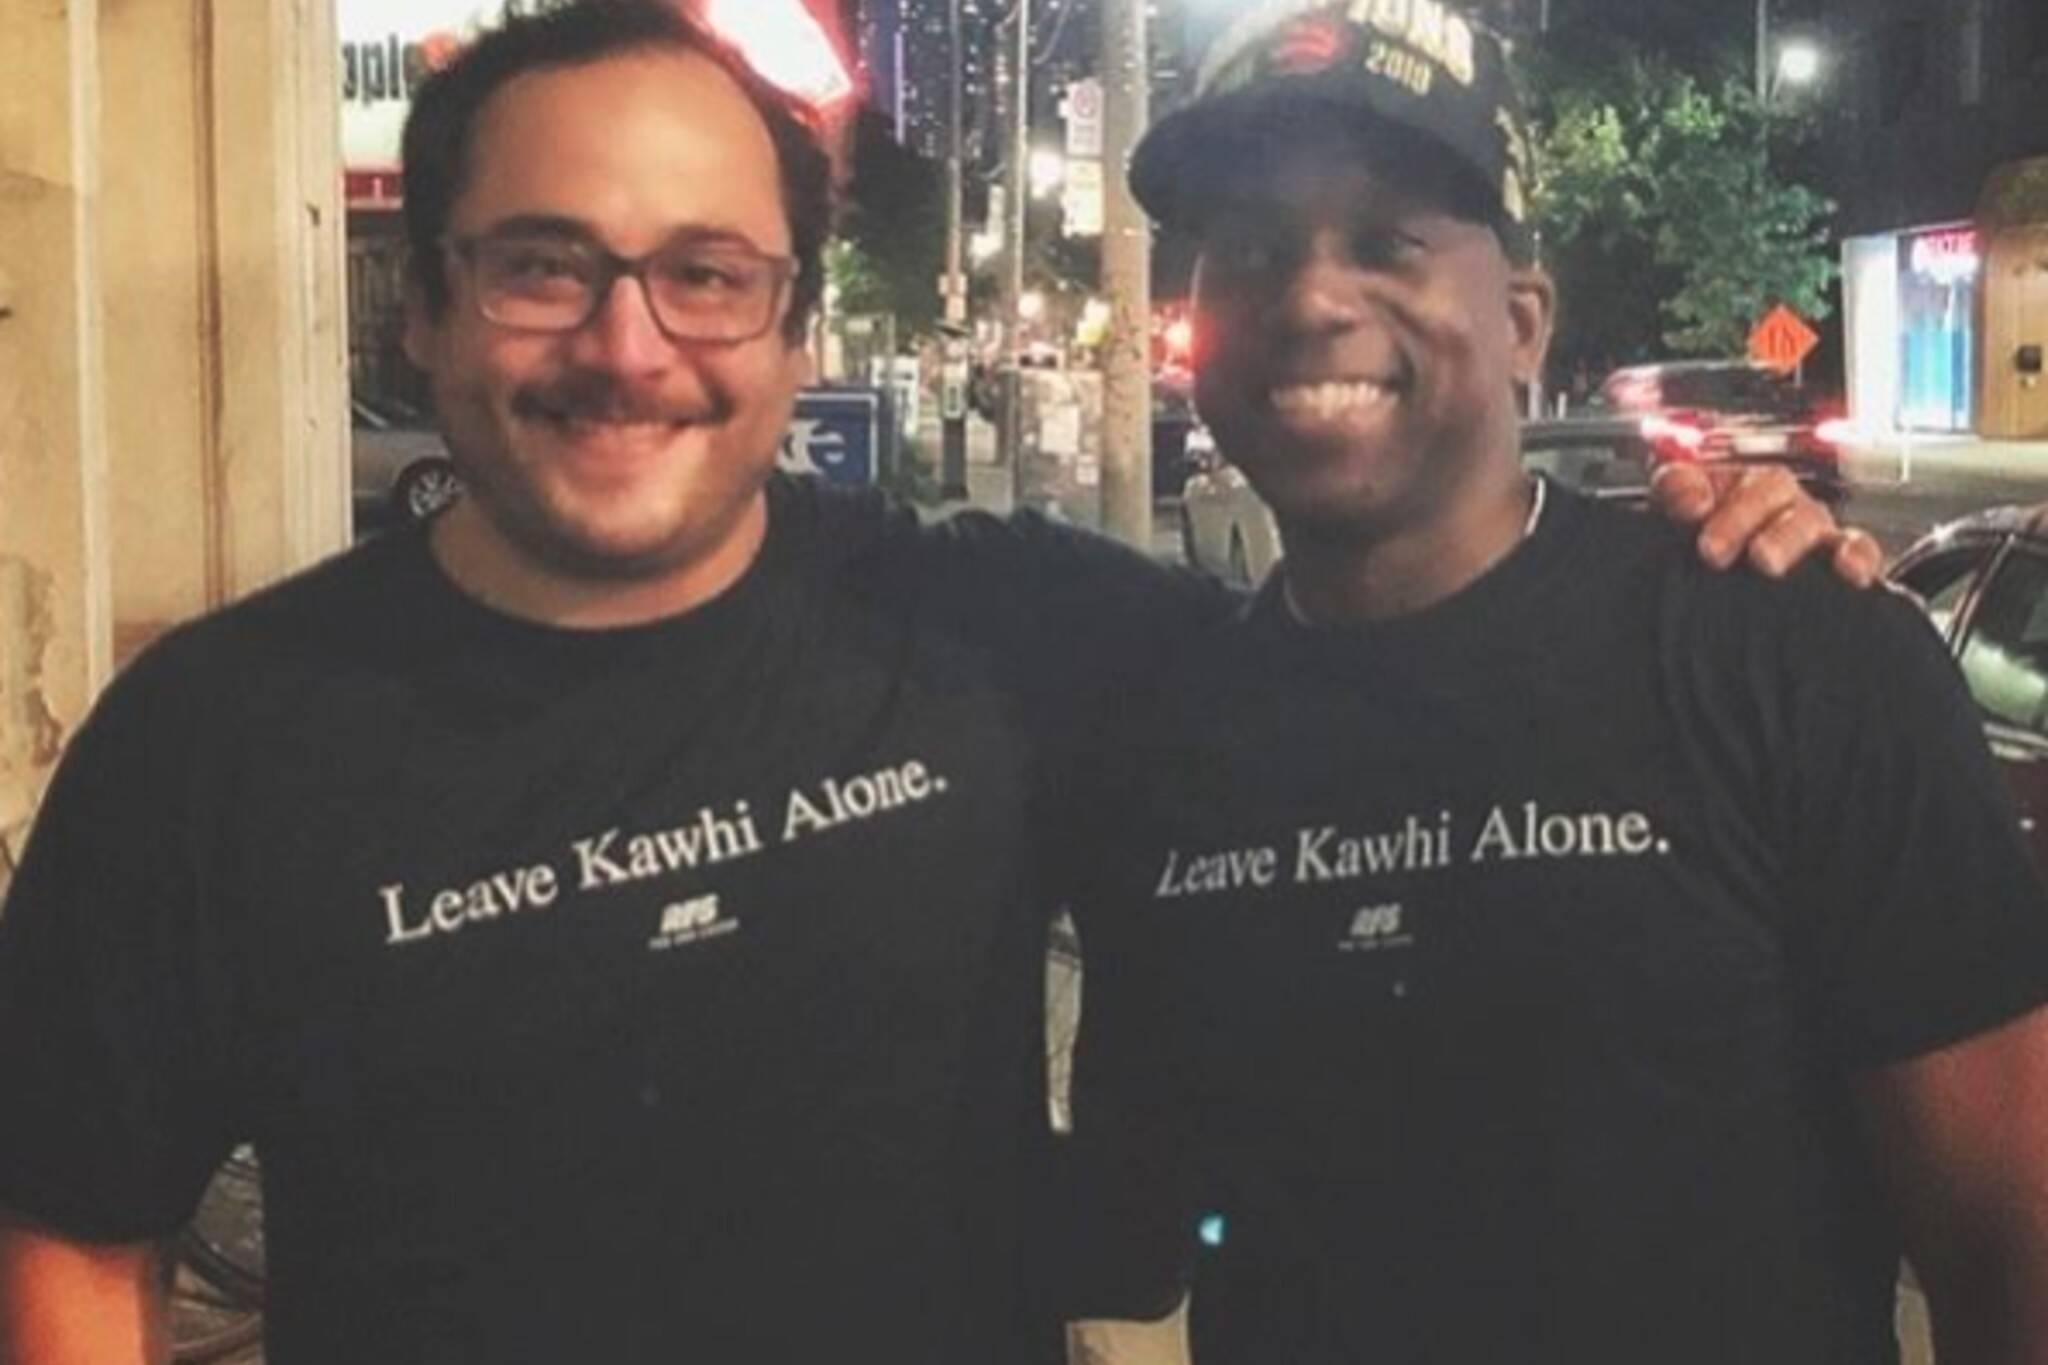 Kawhi Leonard Shirts